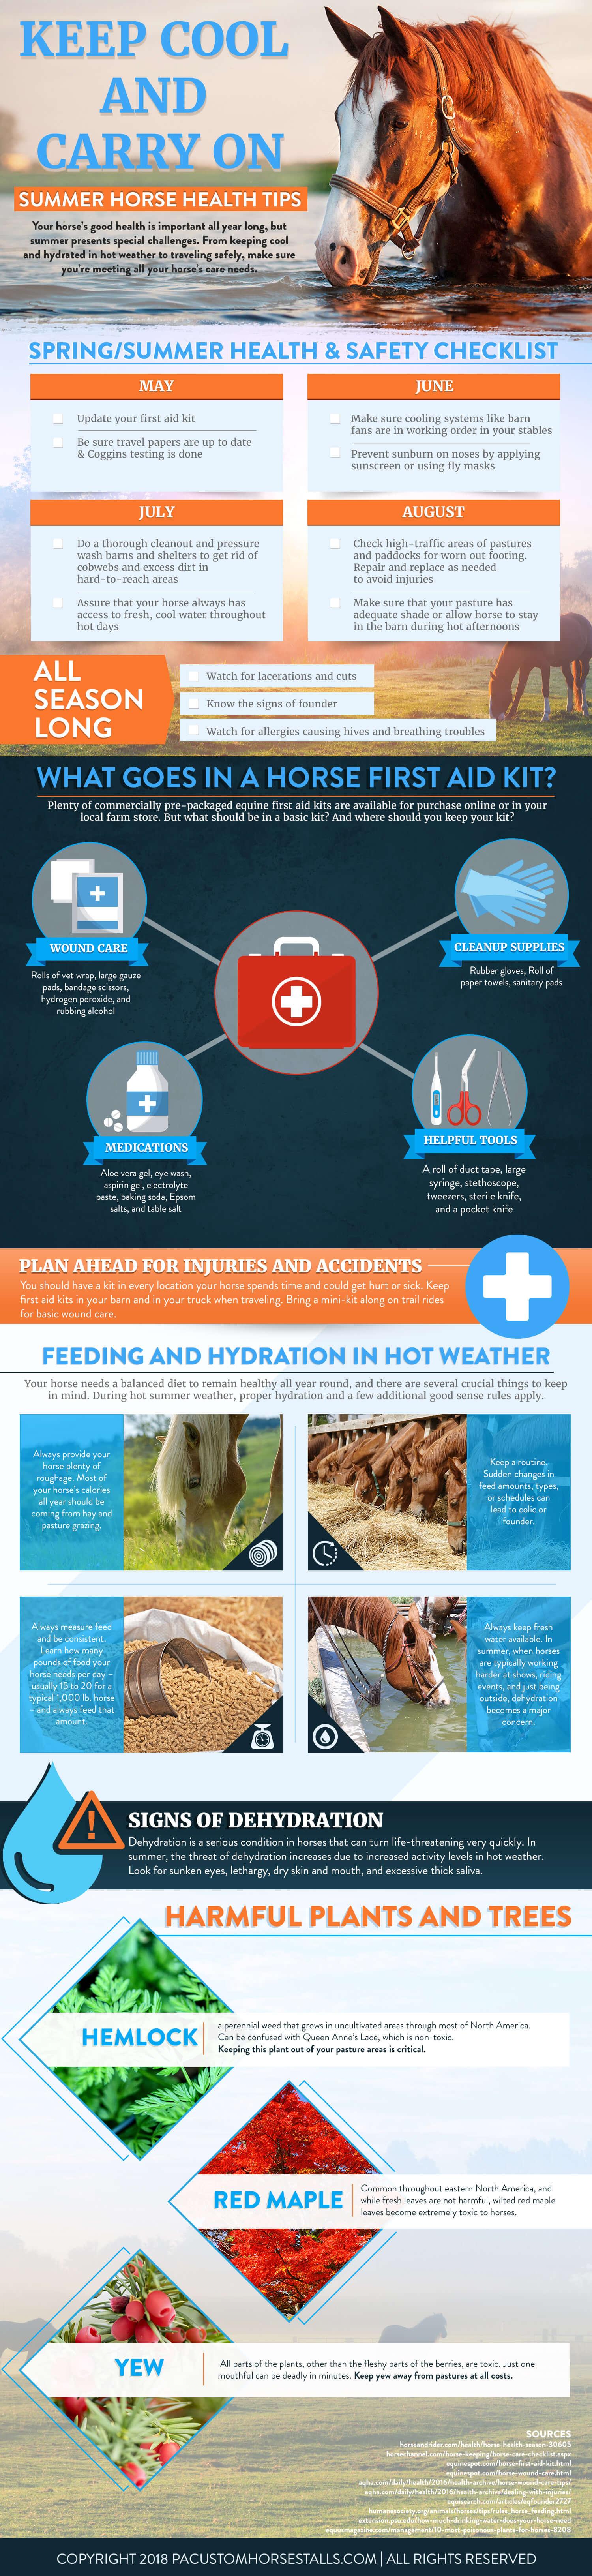 SV-HorseHealth-infographic